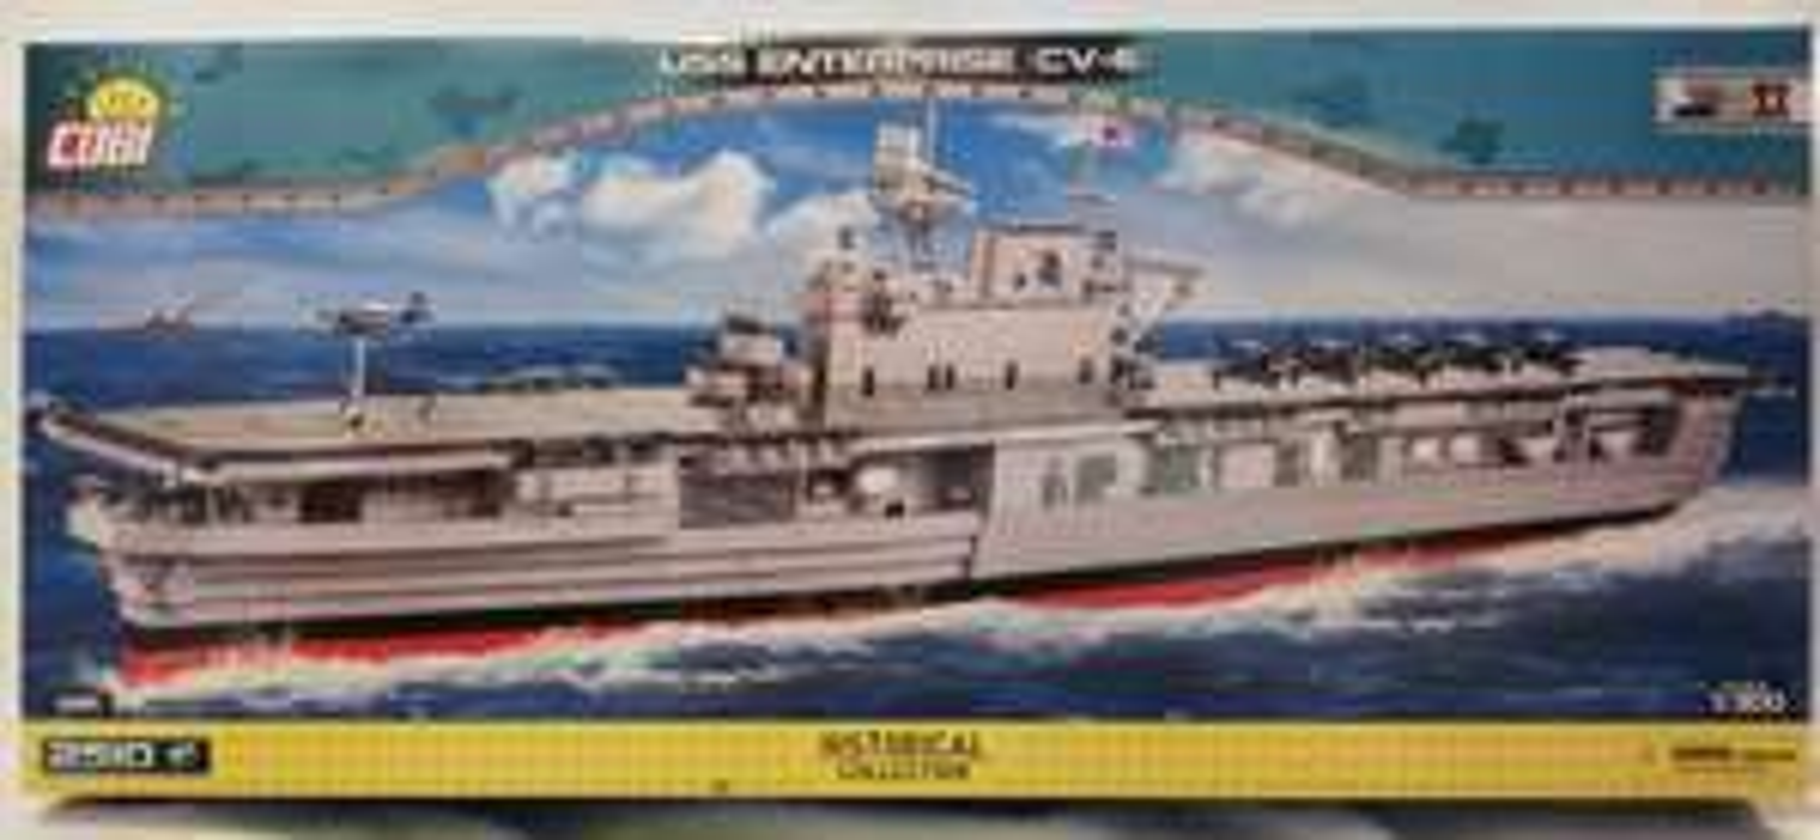 Cobi 4815 USS Enterprise (CV-6)